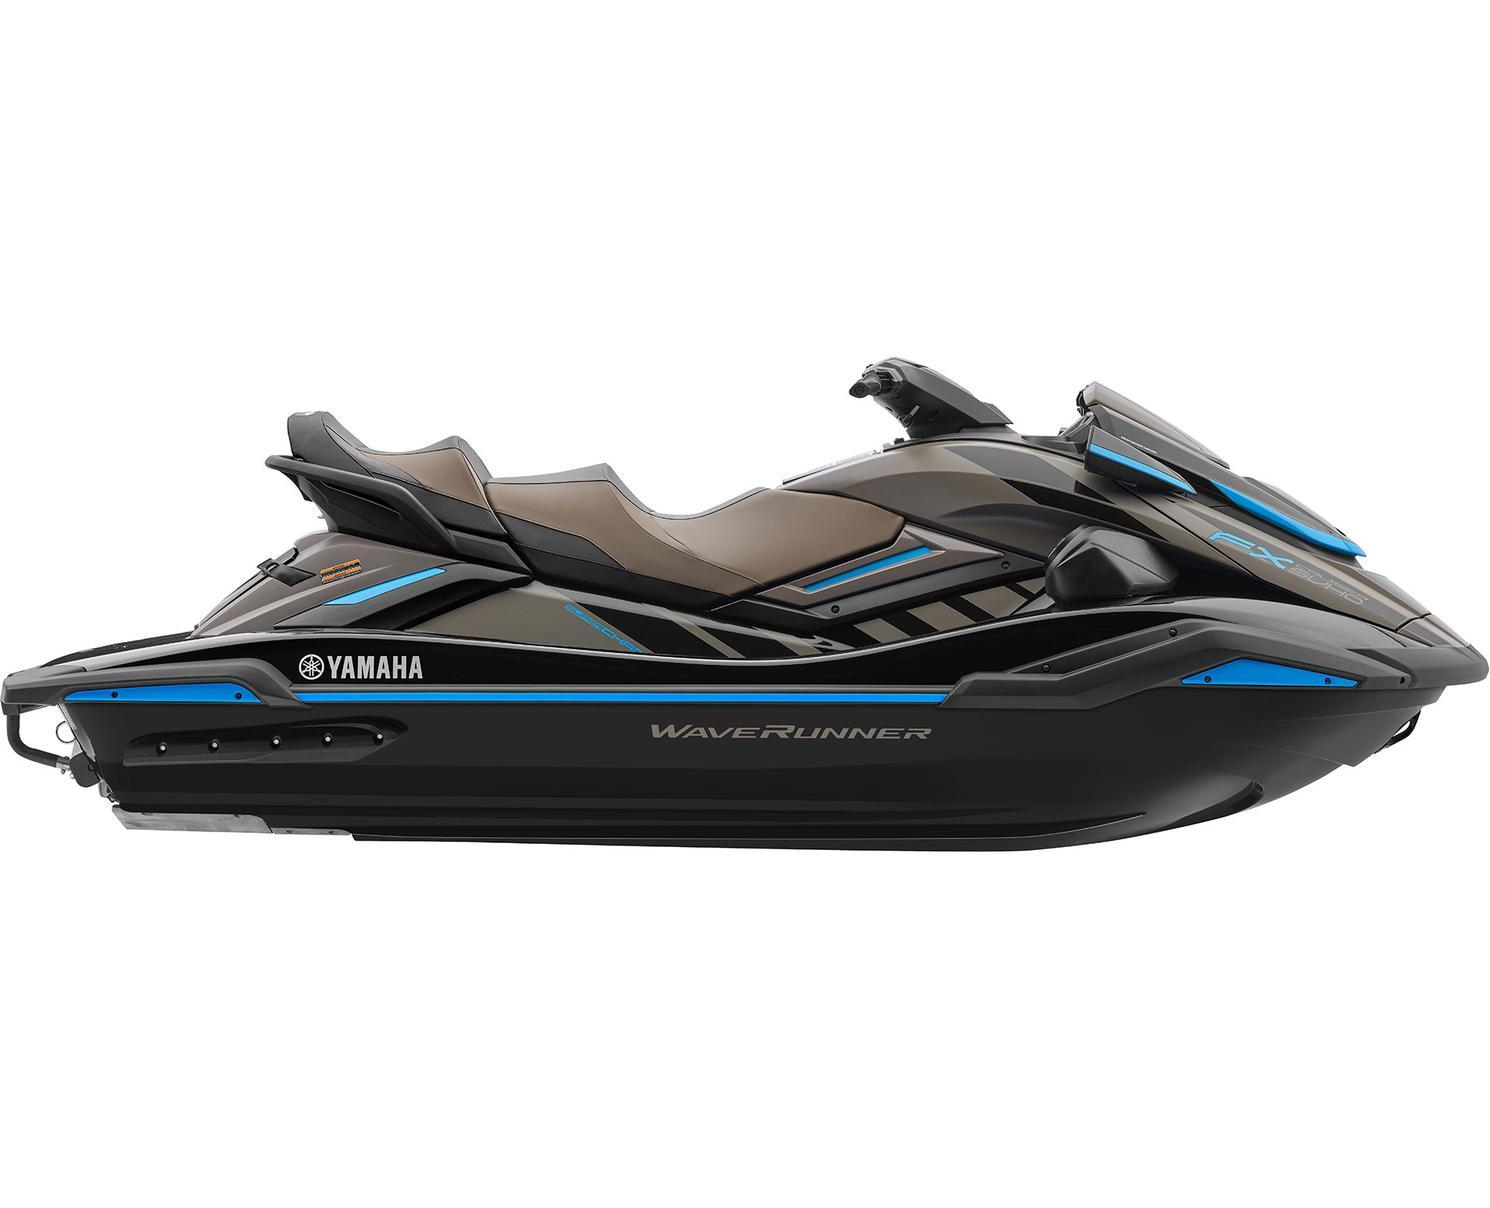 Yamaha FX Cruiser SVHO Noir/Gris Titan 2022